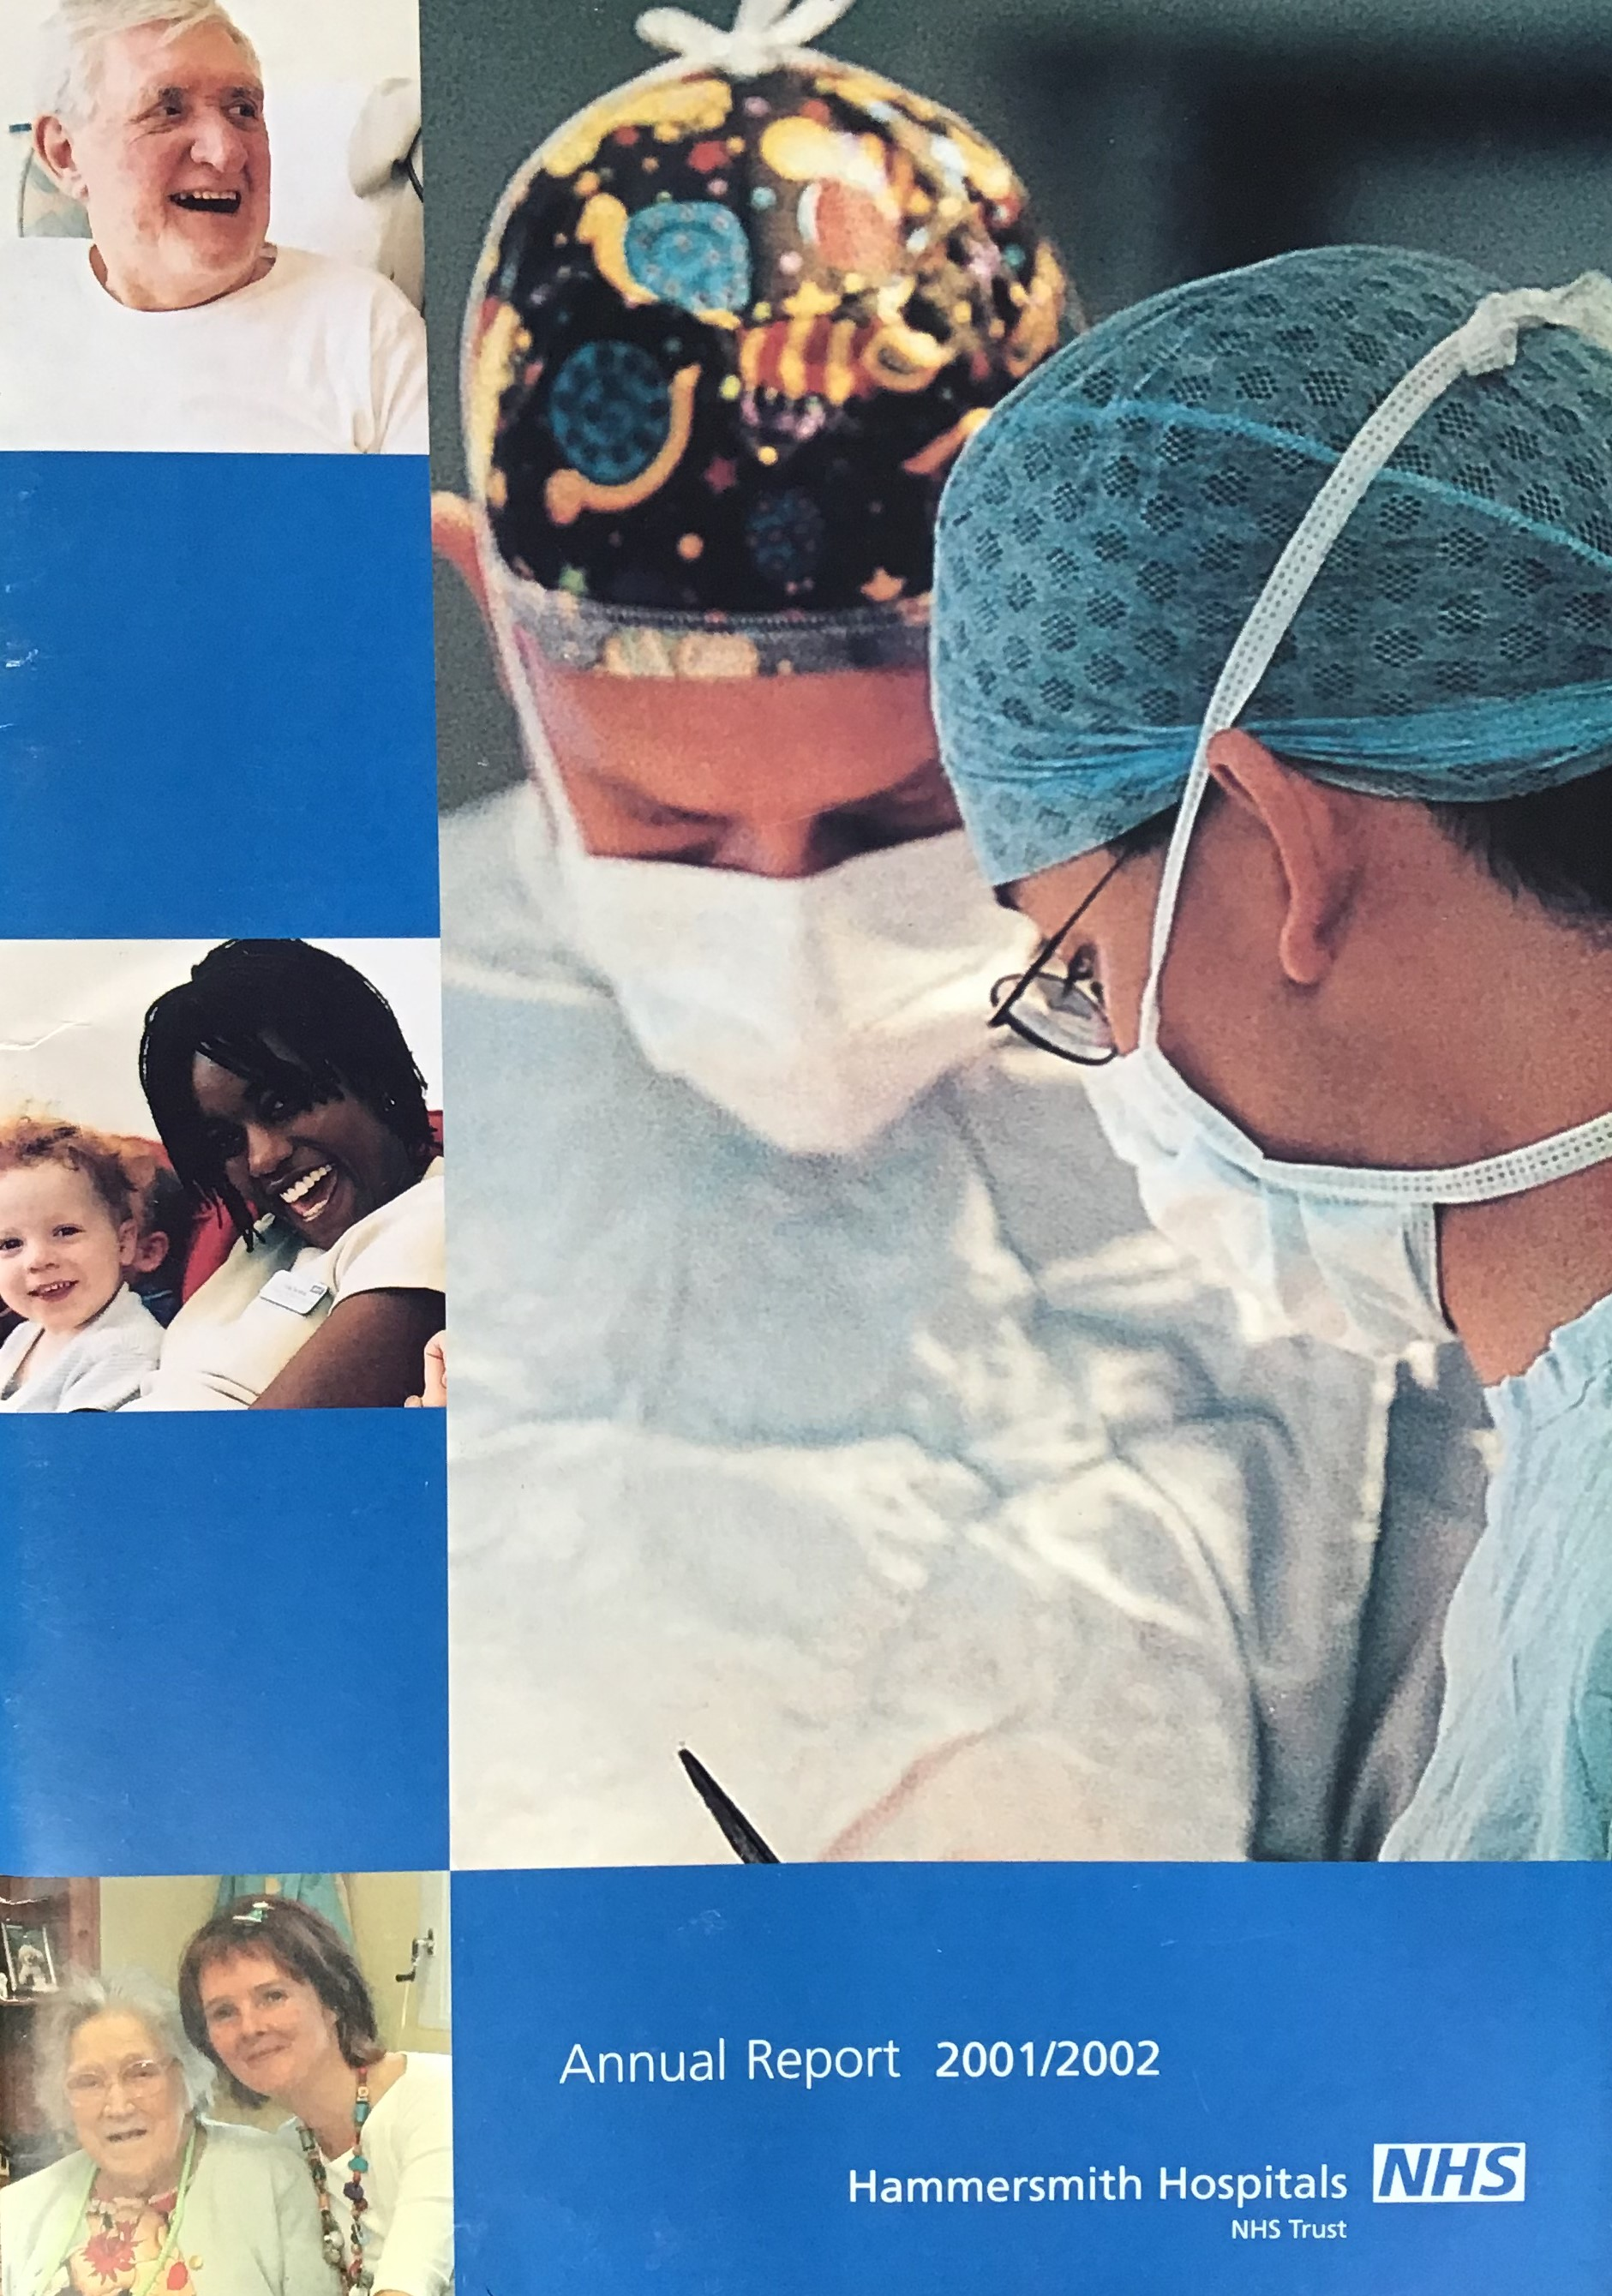 Hammersmith hospitals annual report 2001.jpg